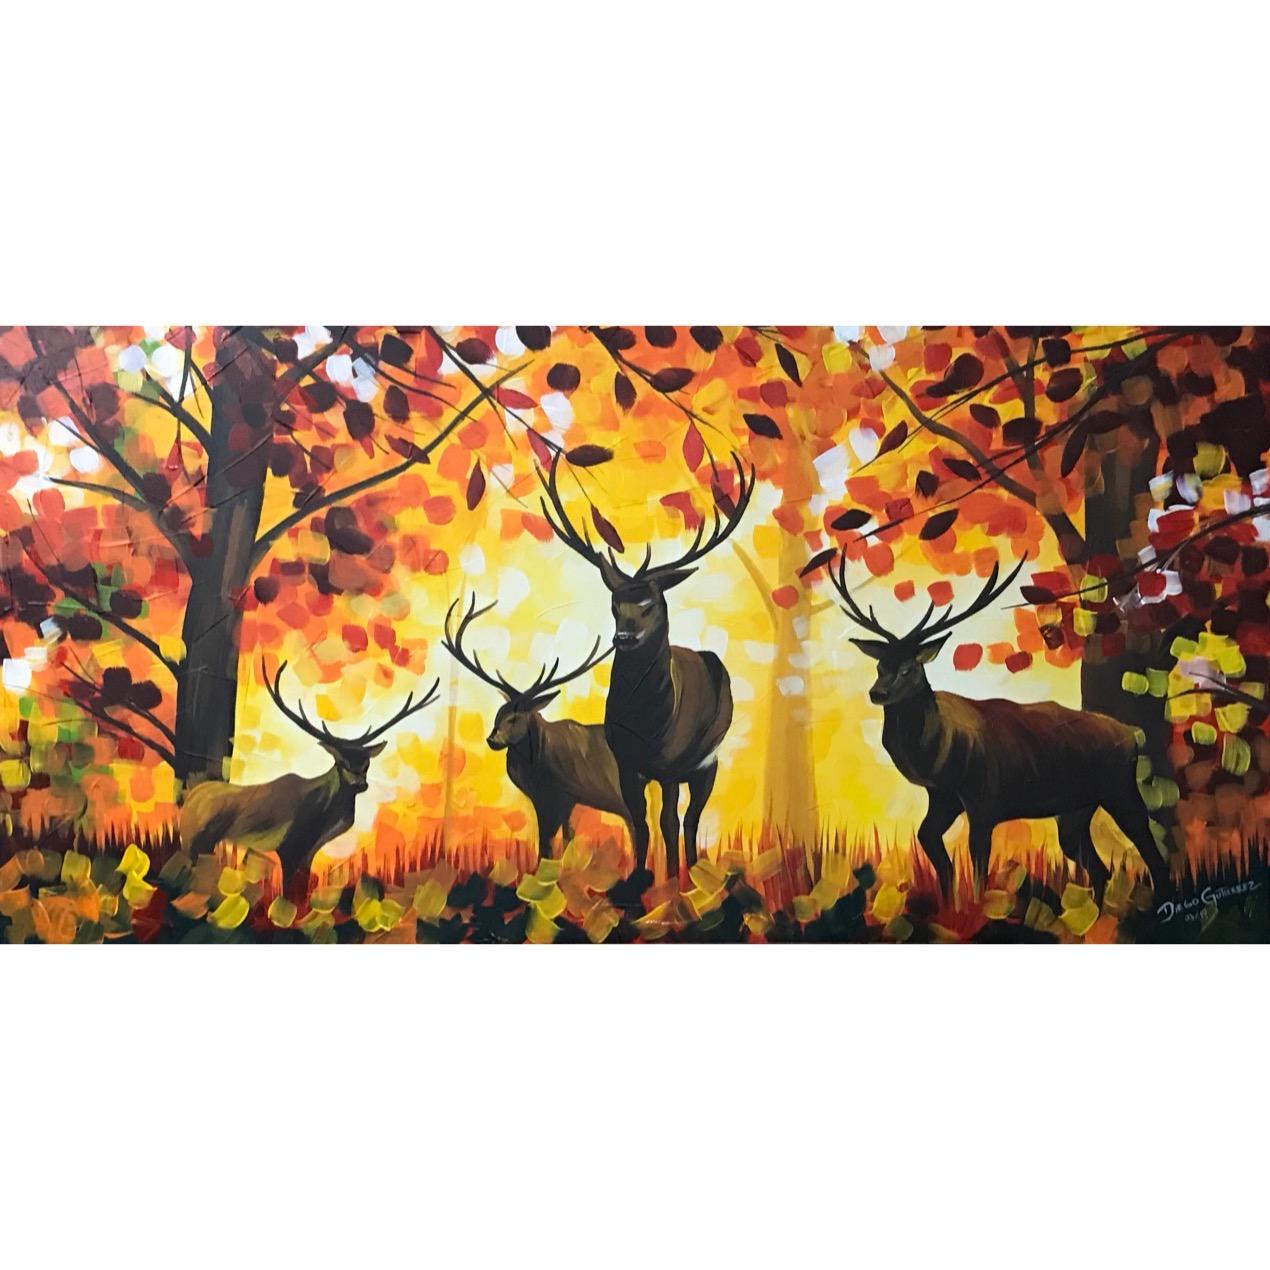 diego-gutierrez-gallery-commissions-reinder-fall-04